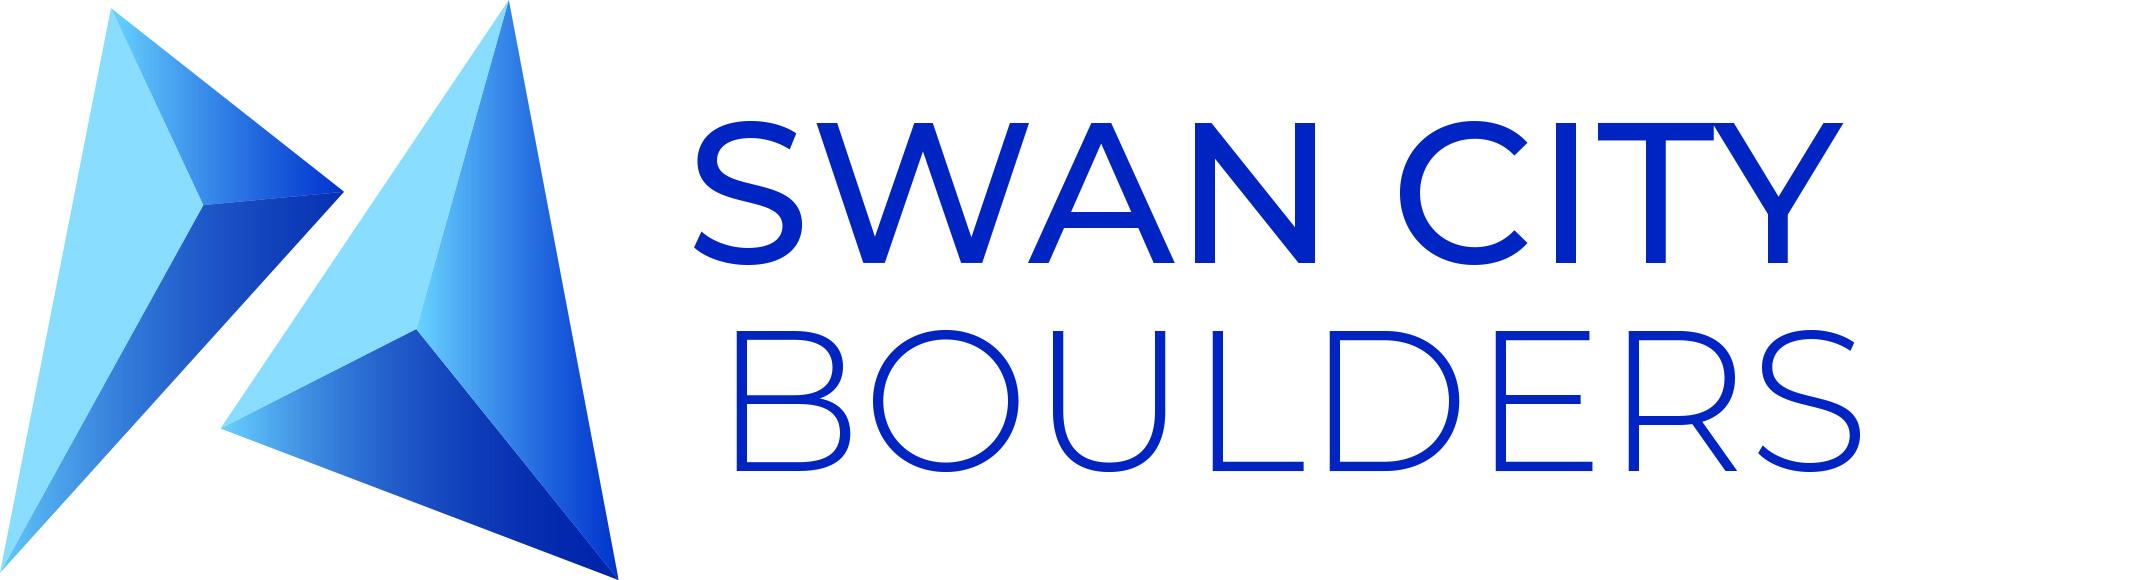 Swan City